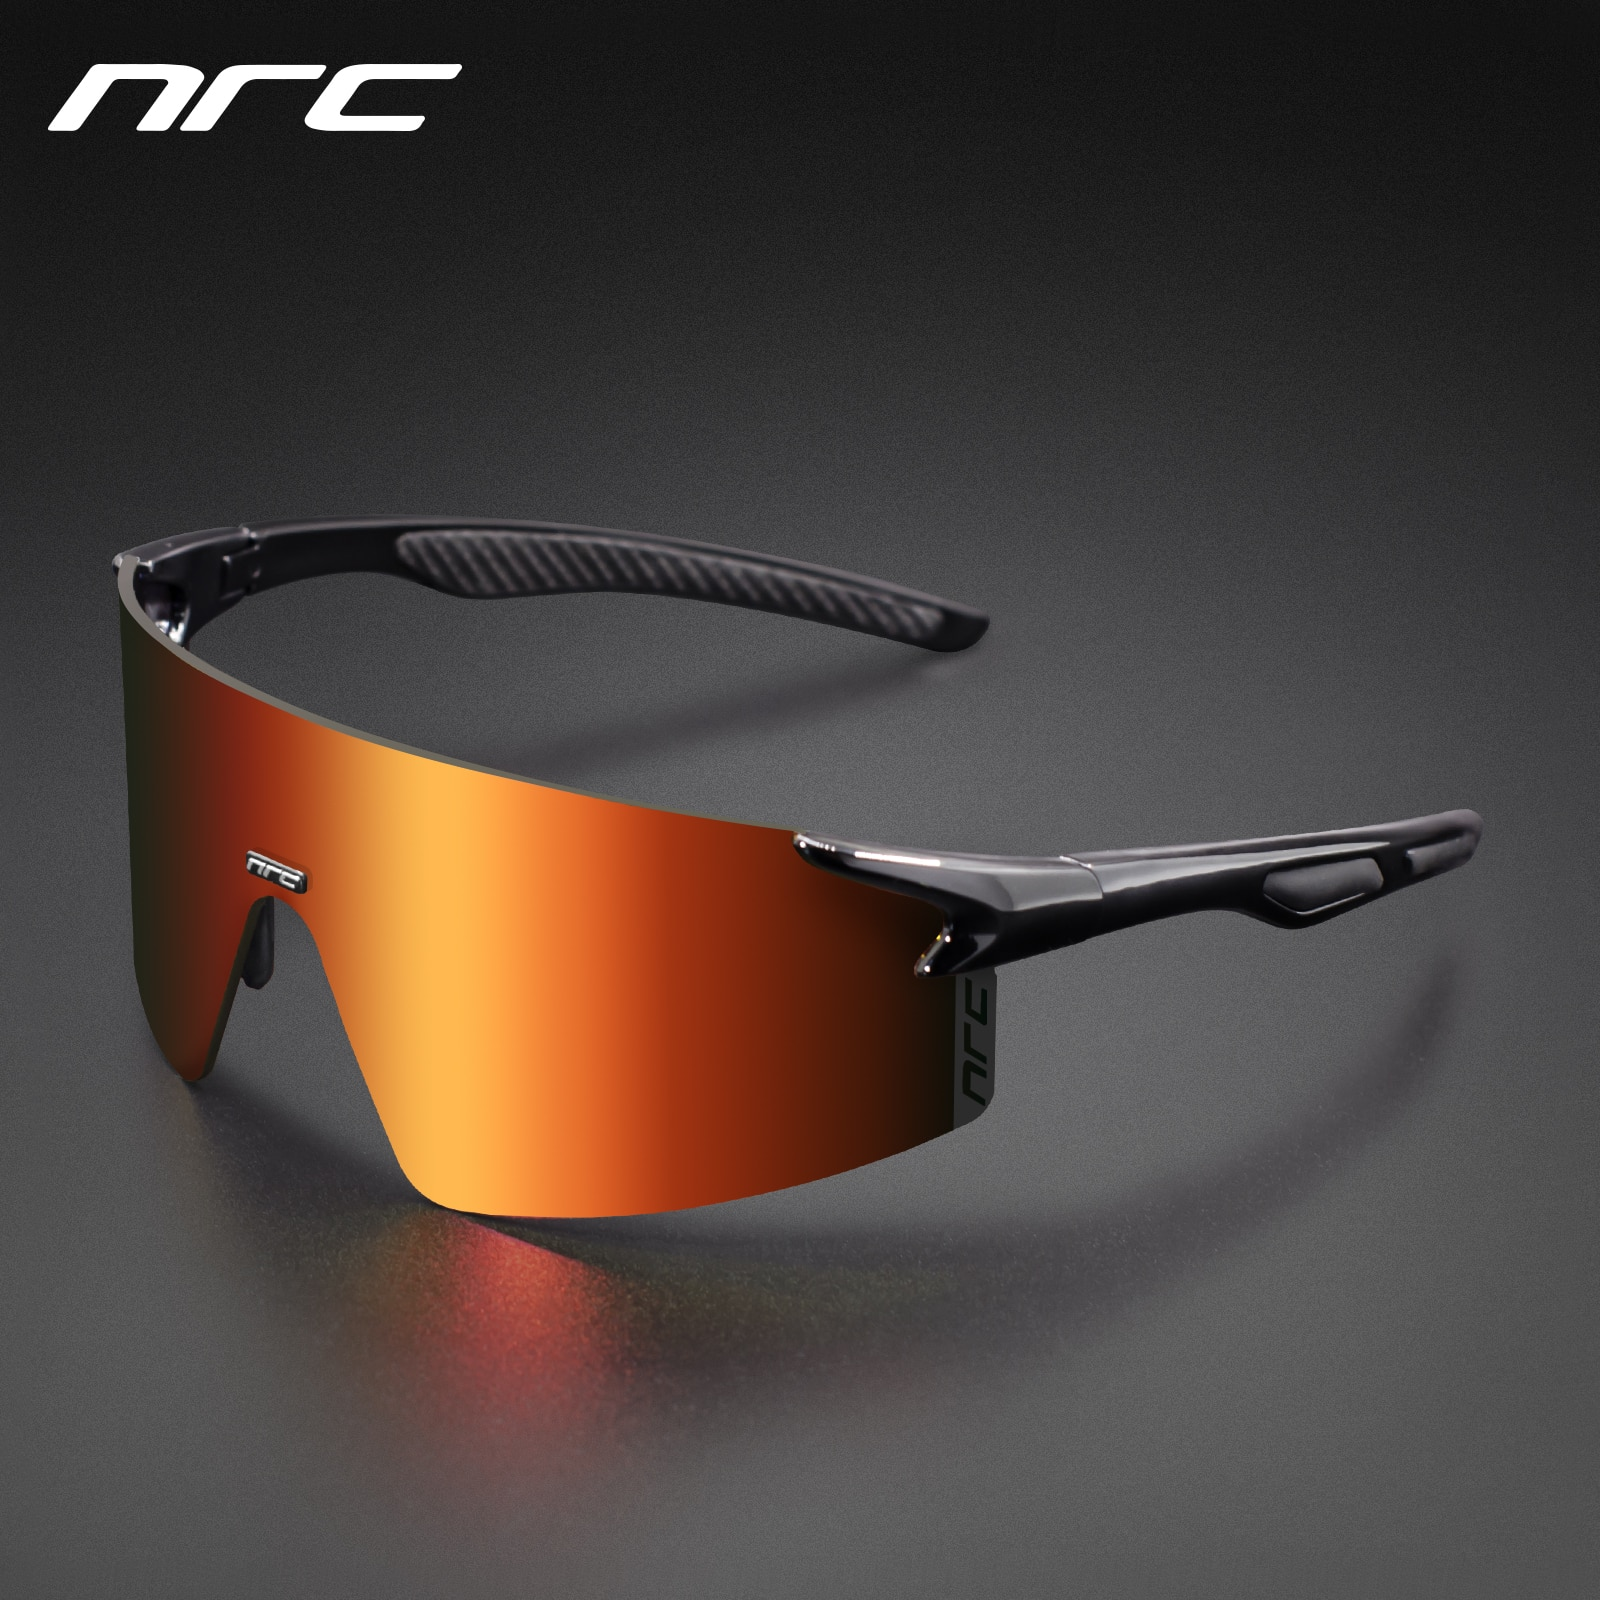 NRC 3 Lens UV400 Cycling Sunglasses TR90 Sports Bicycle Glasses MTB Mountain Bike Fishing Hiking Riding Eyewear for men women